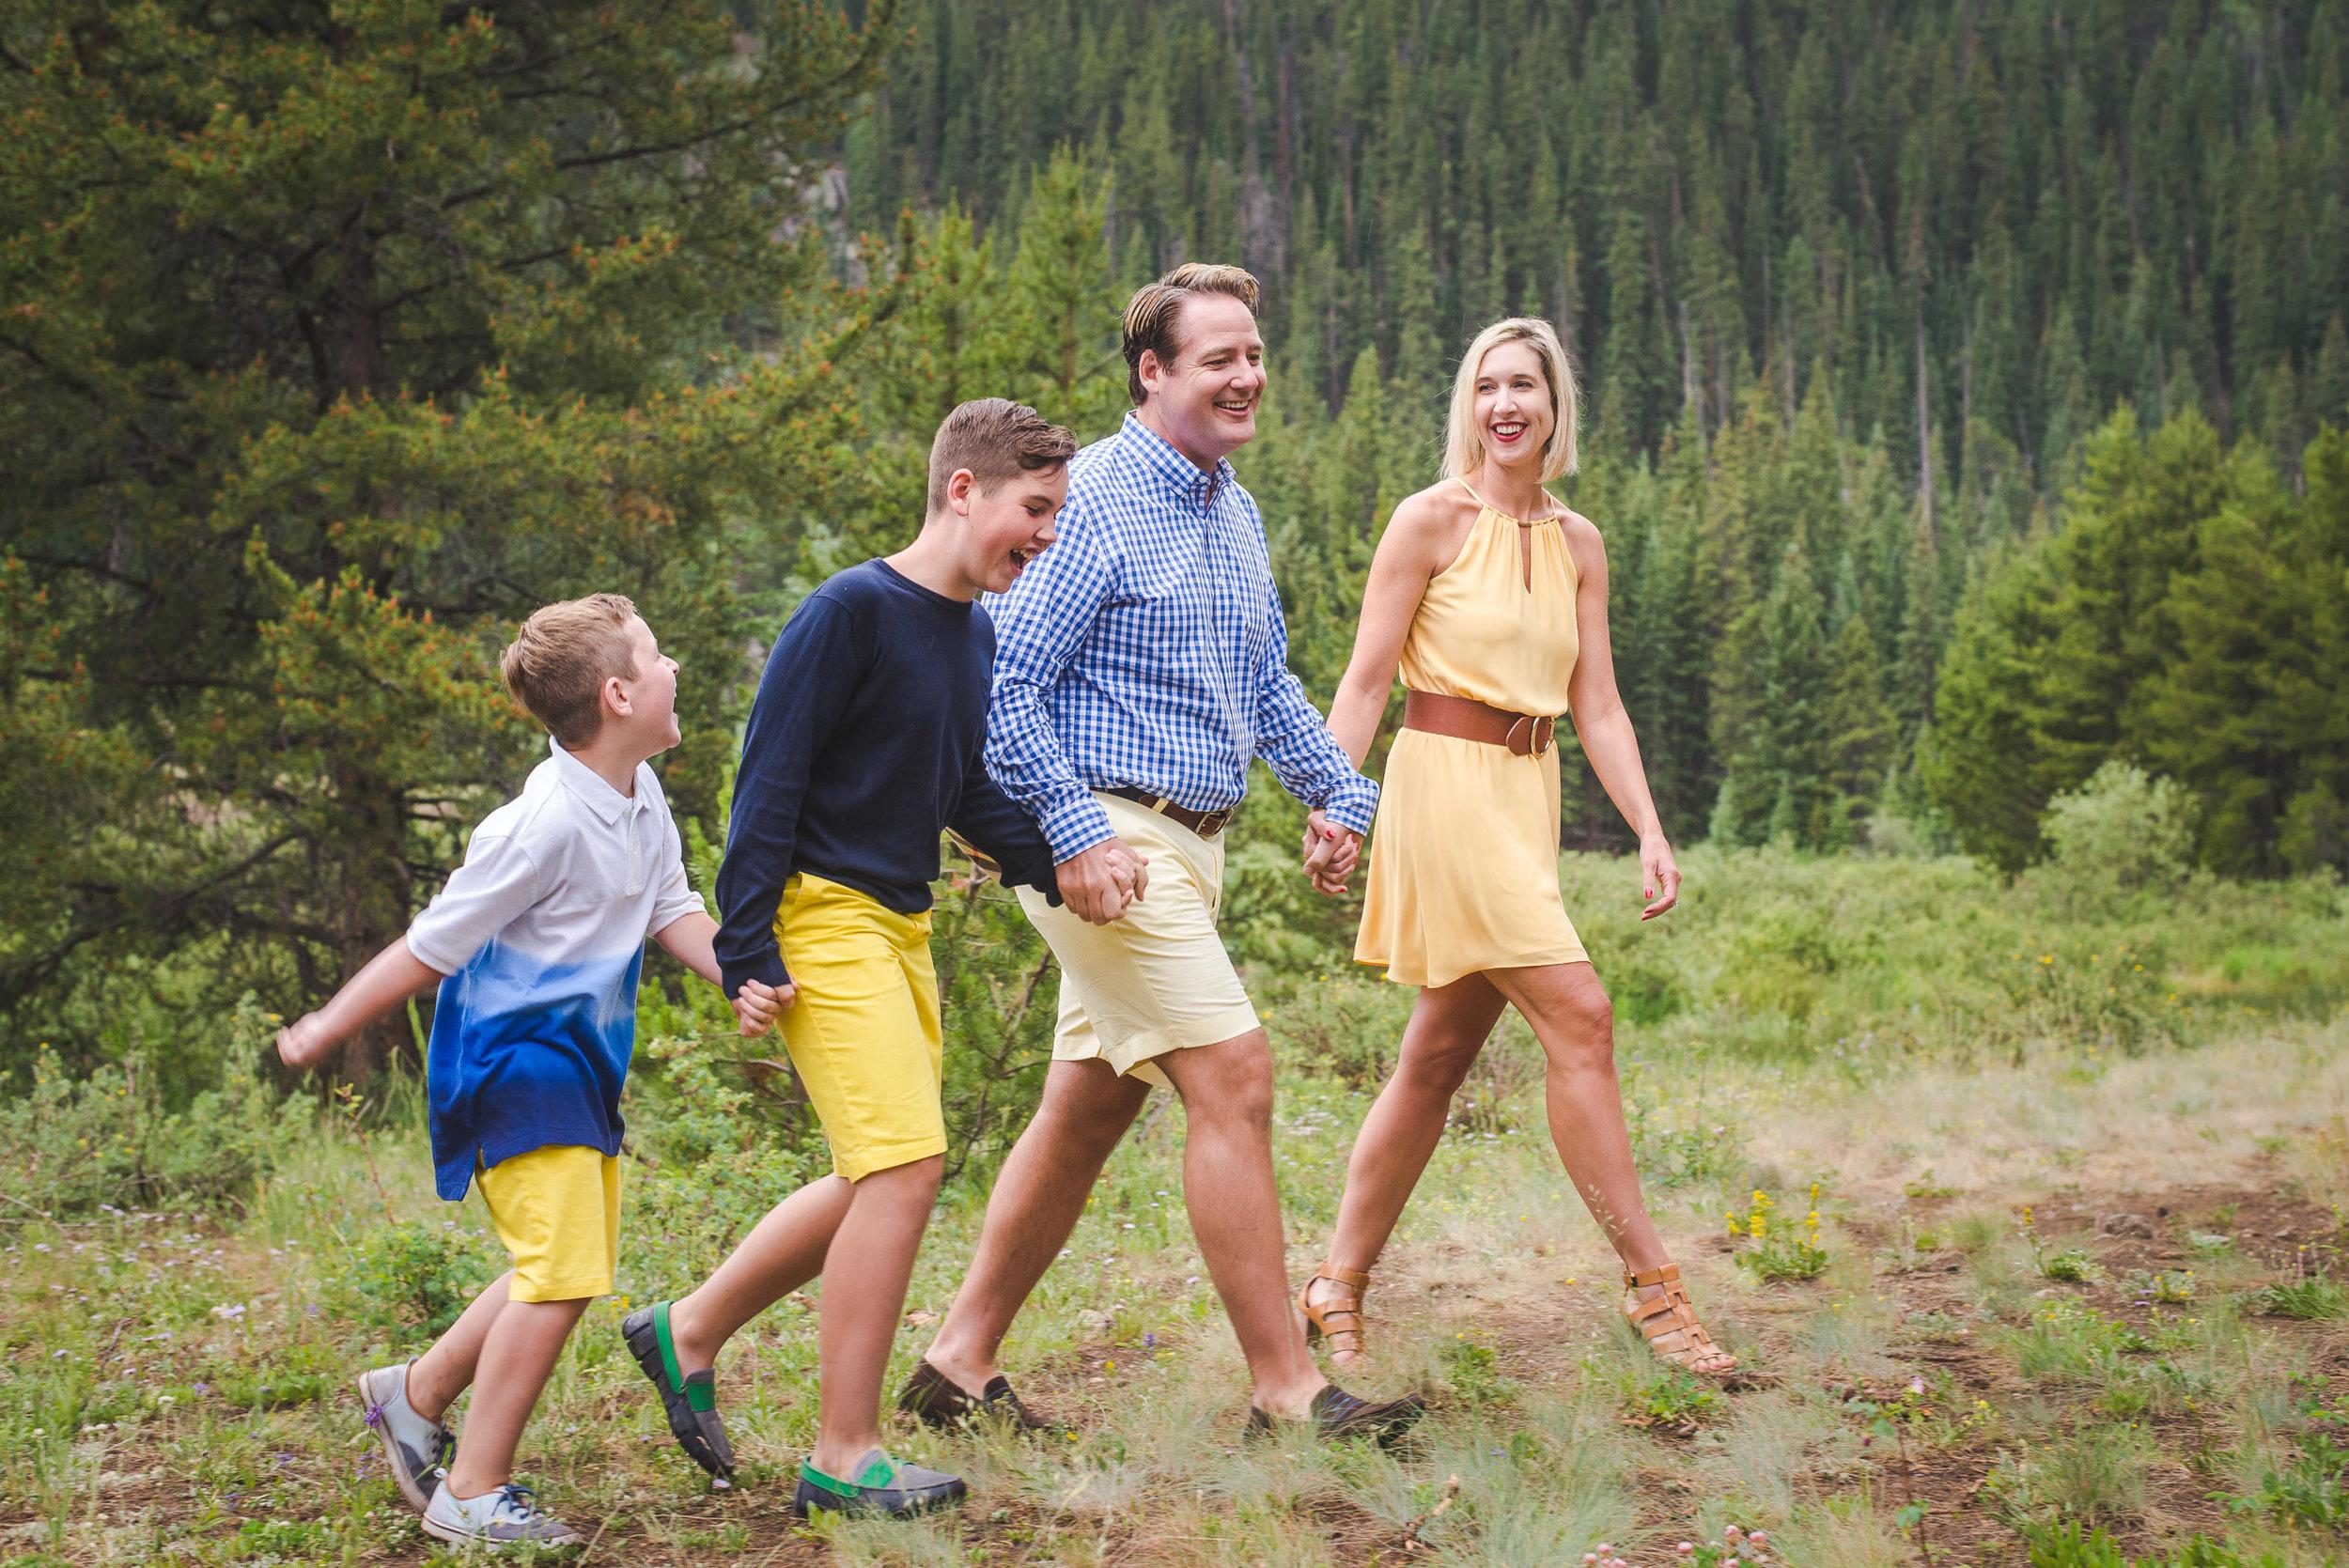 07.10.17_Keystone-Colorado-Family-Portraits-10.jpg